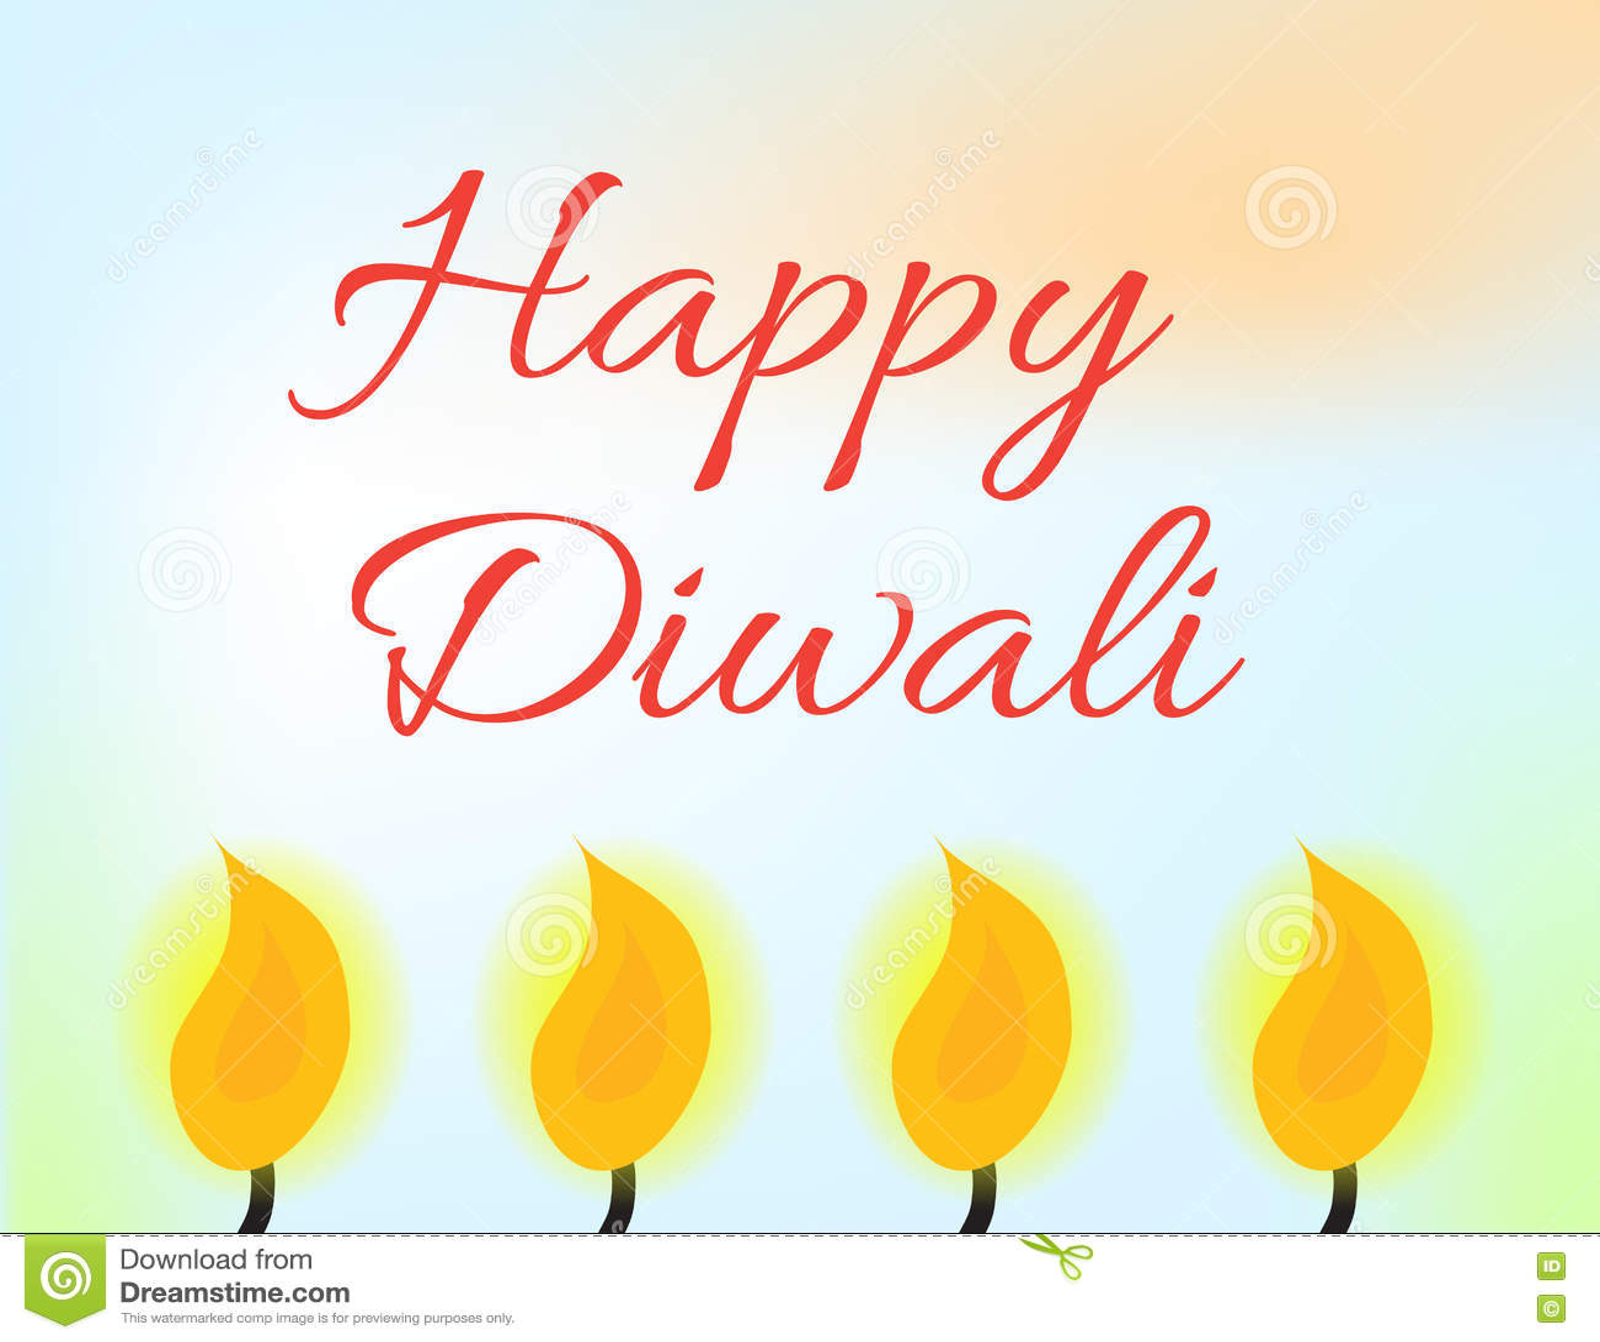 Happy Diwali Indian Festival Of Lights Diwali Greeting Card